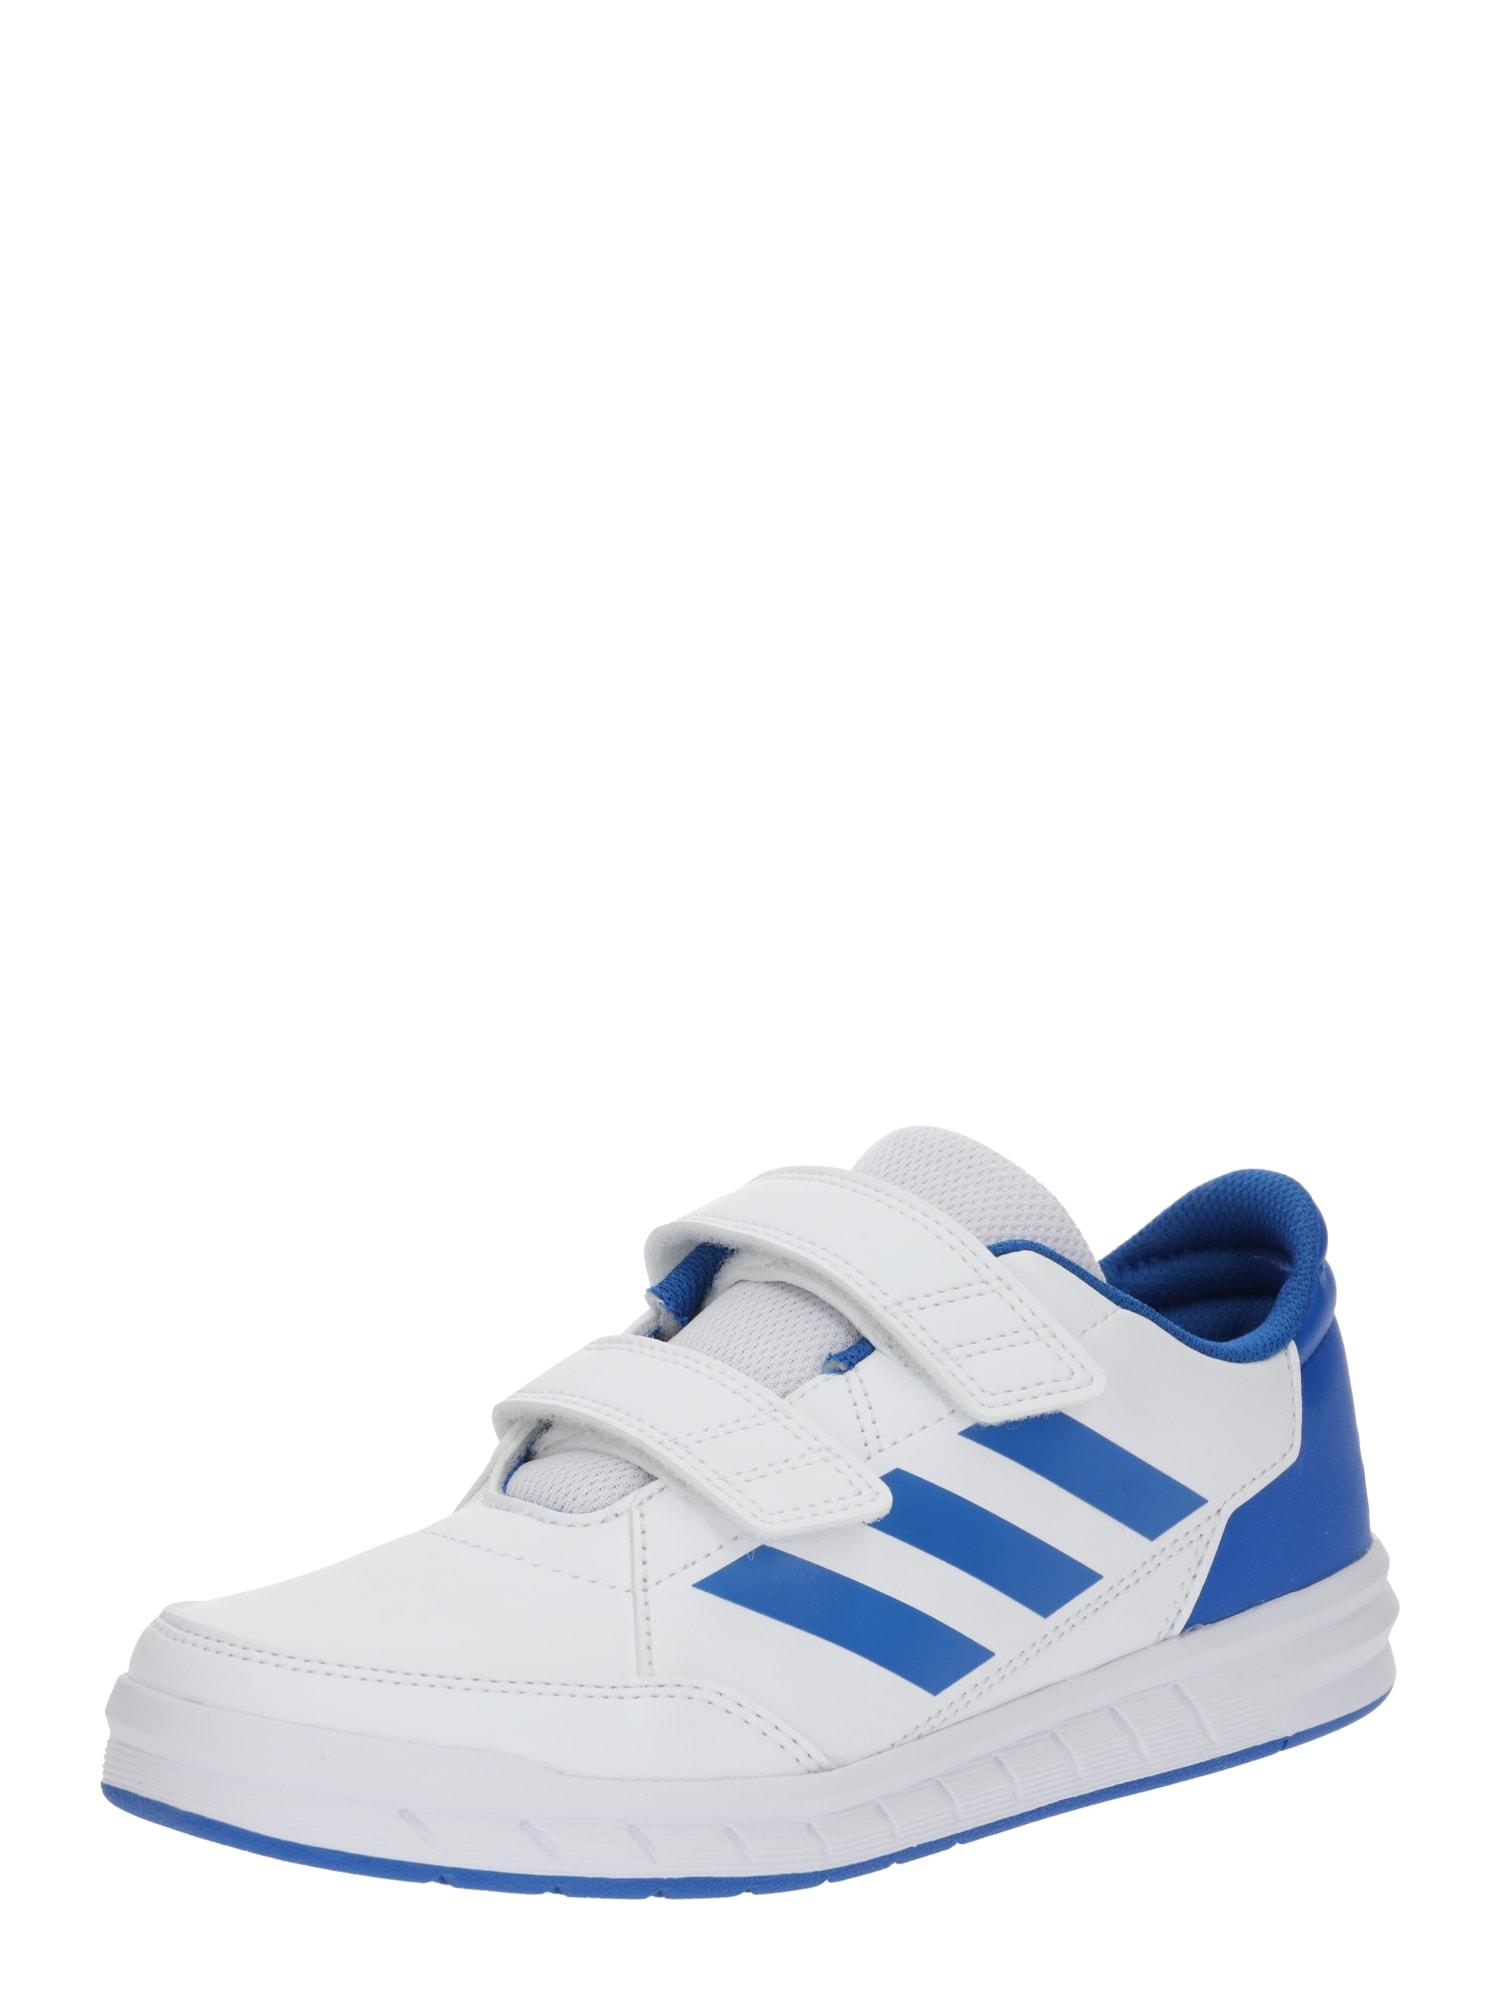 Sportovní boty AltaSport CF K modrá bílá ADIDAS PERFORMANCE